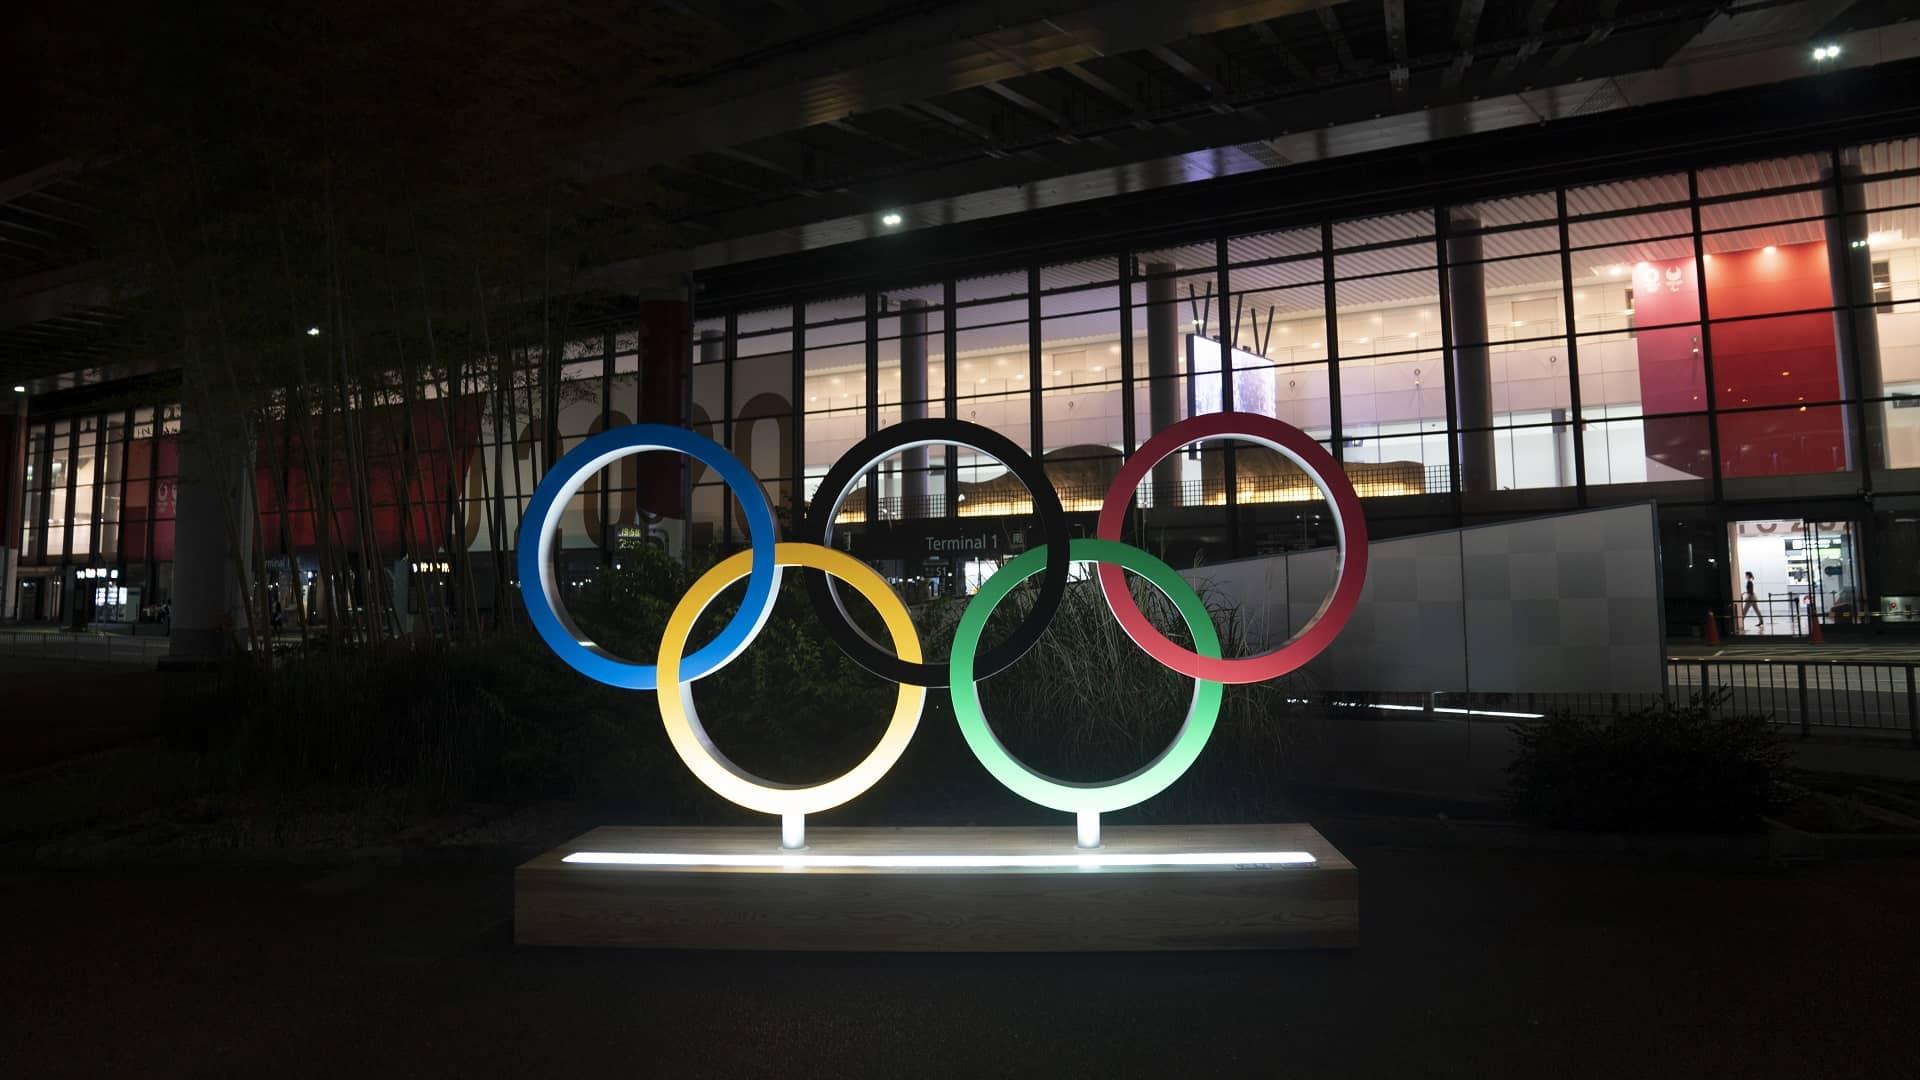 Sneaking a peek: Fans find creative ways to glimpse Olympics